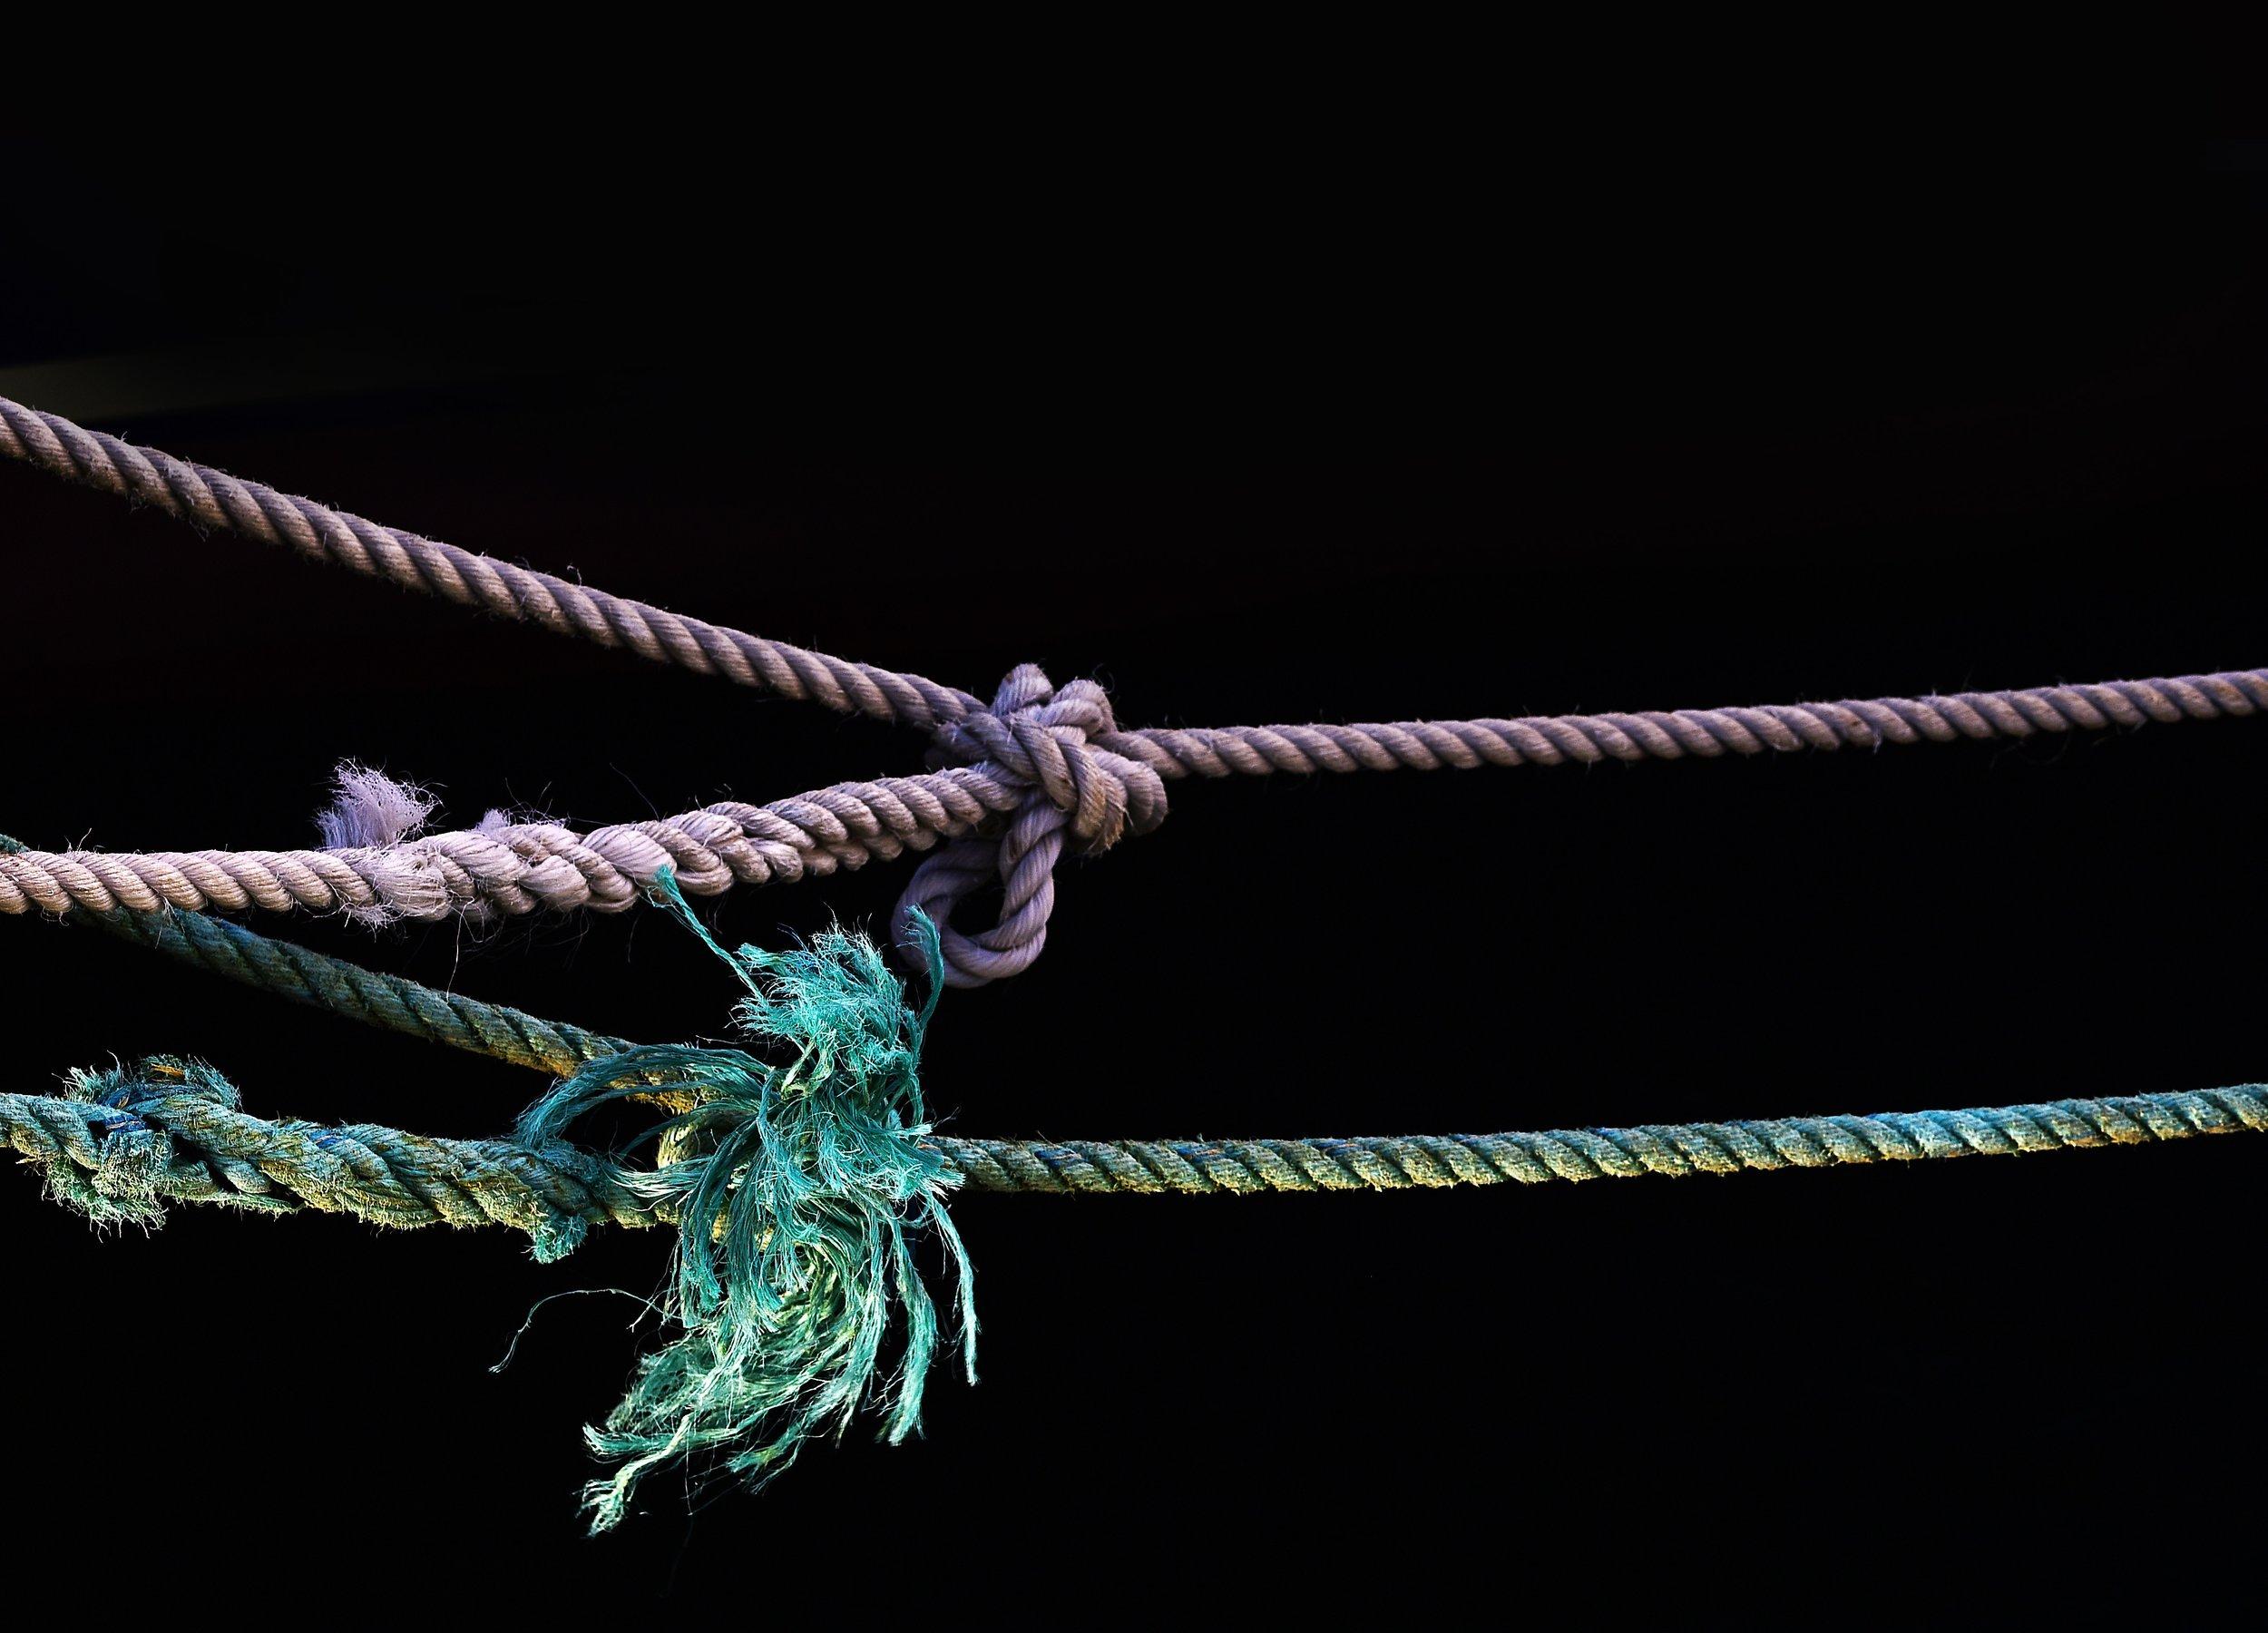 Untie the knot: A Kierkegaardian approach to education.